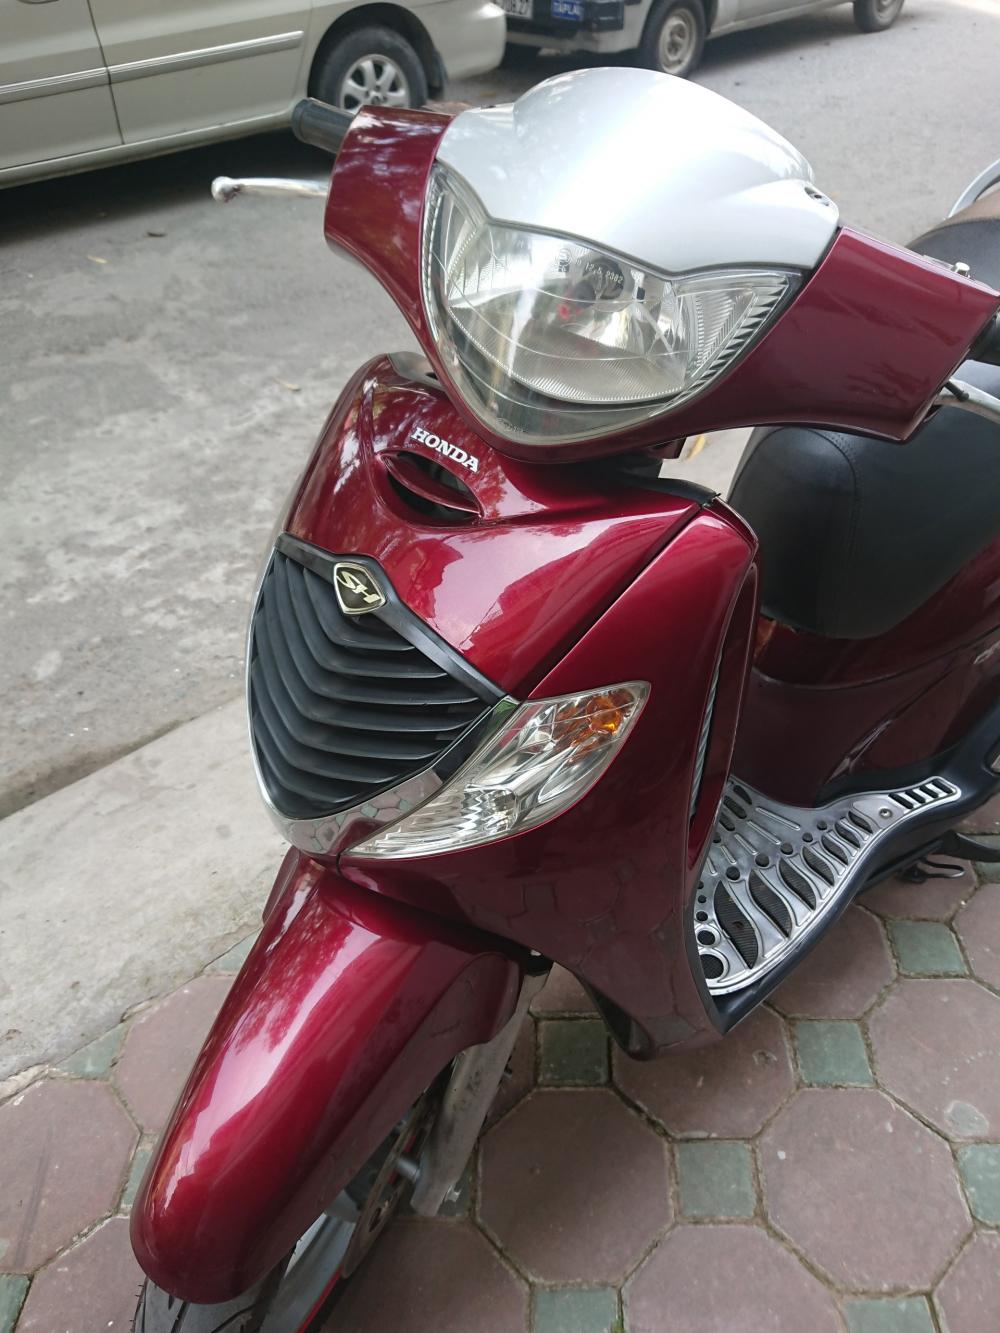 Rao ban Honda Sh 150i do man 2008 bien HN nguyen ban 57tr500 - 4